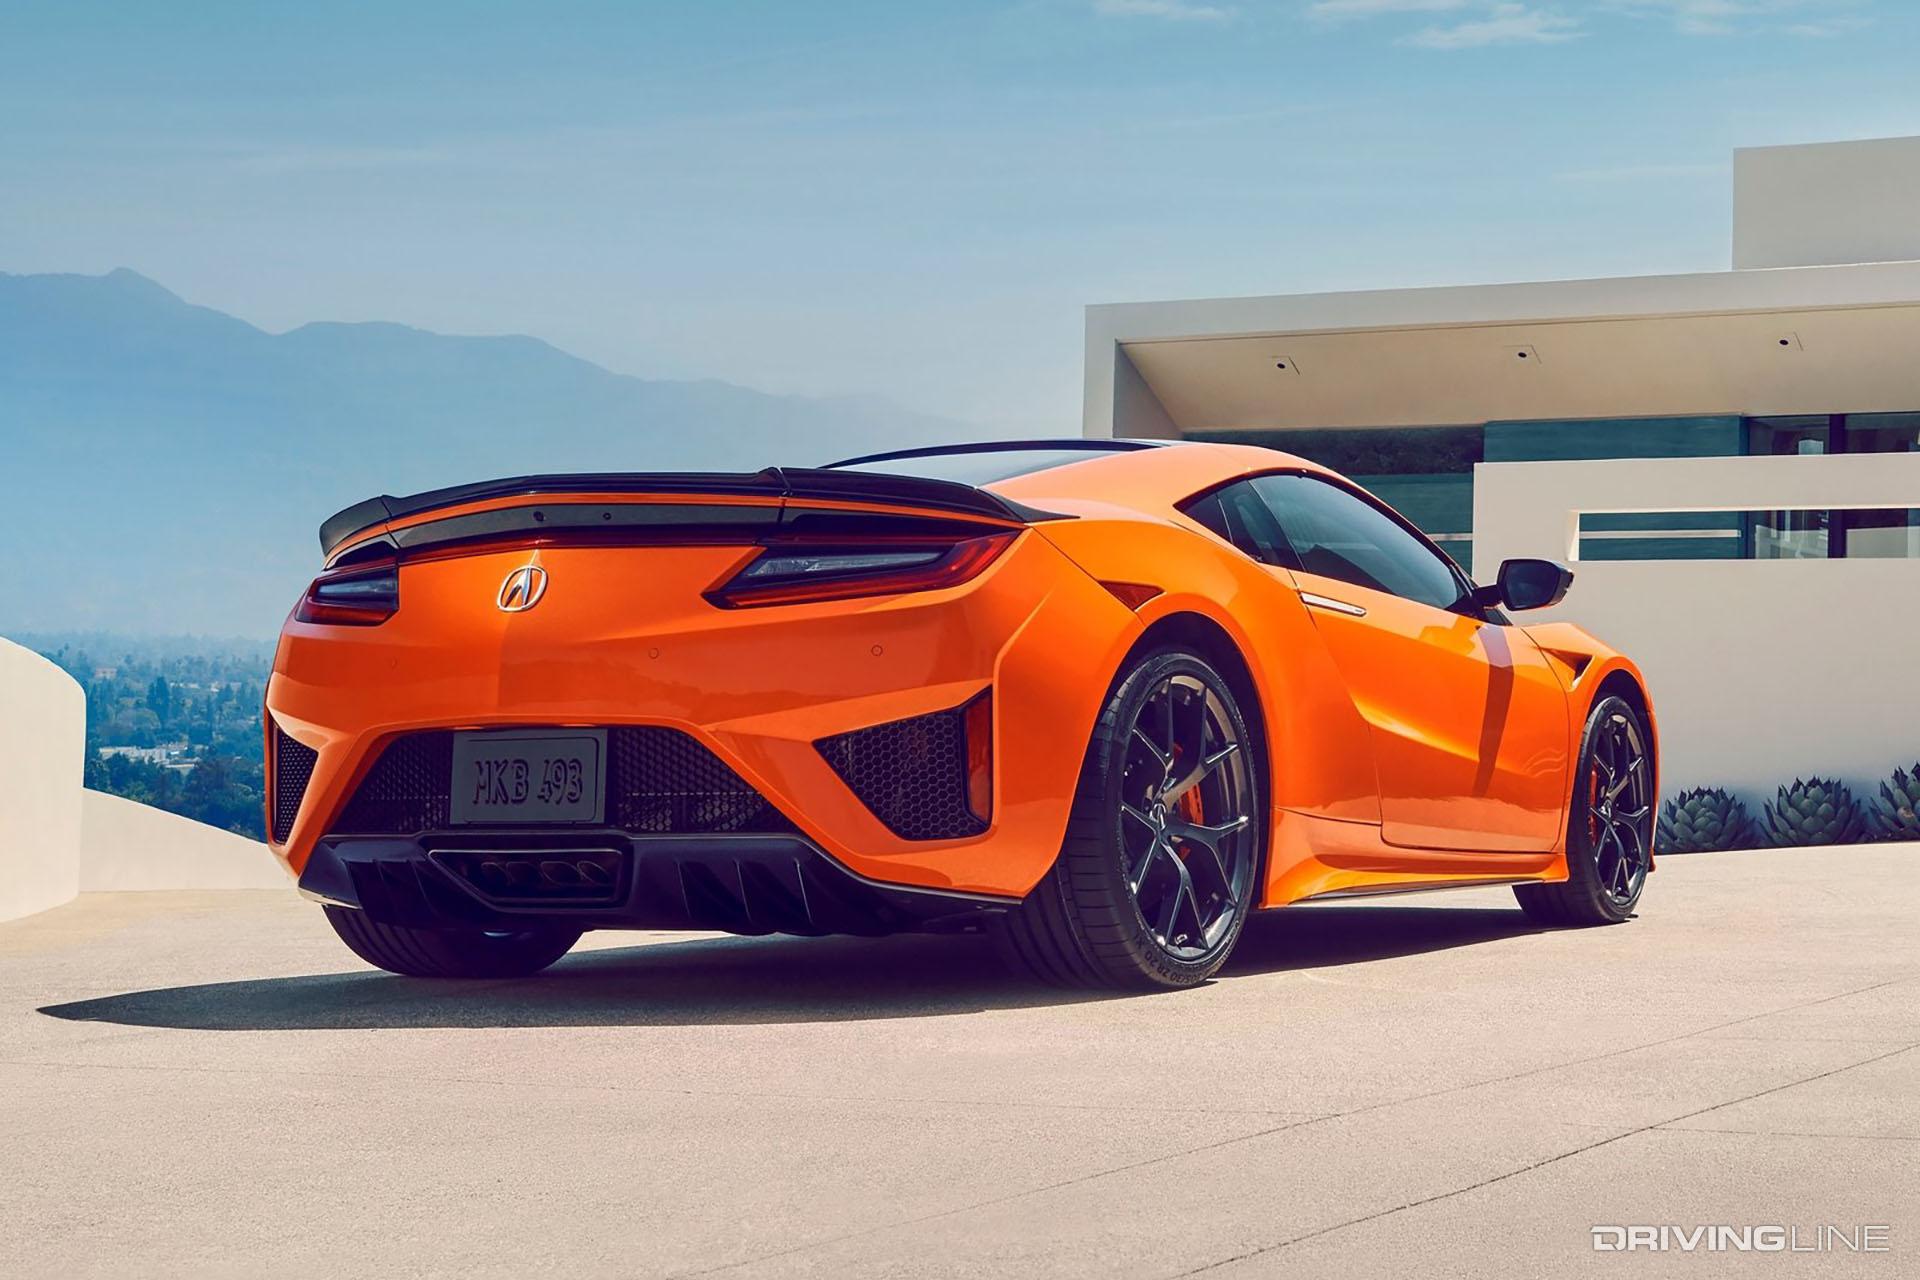 Mid-Engine Showdown: Acura NSX vs 2020 C8 Corvette | DrivingLine